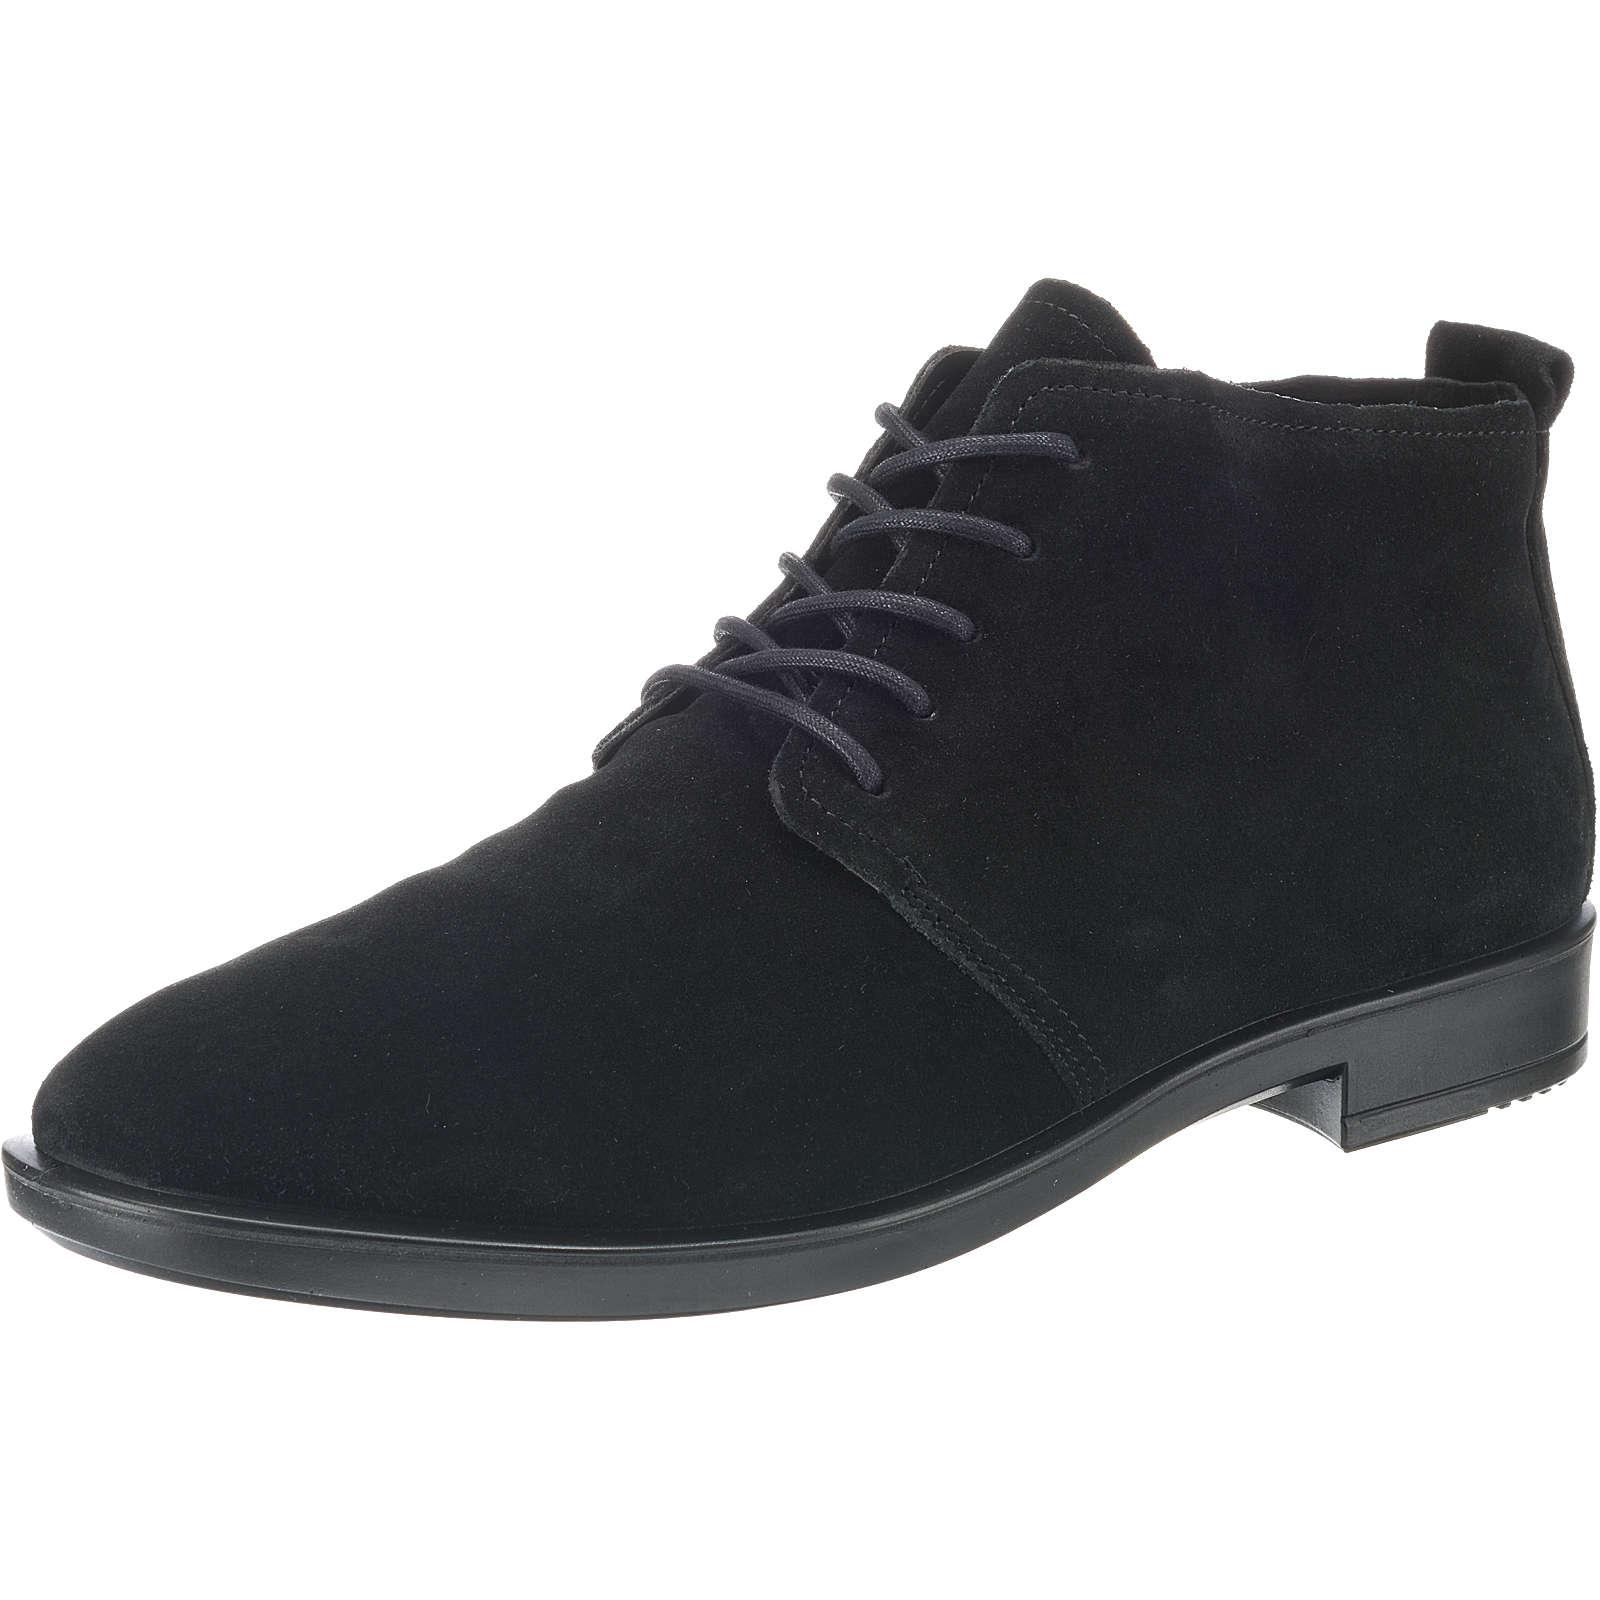 ecco Shape M 15 Ankle Boots schwarz Damen Gr. 38